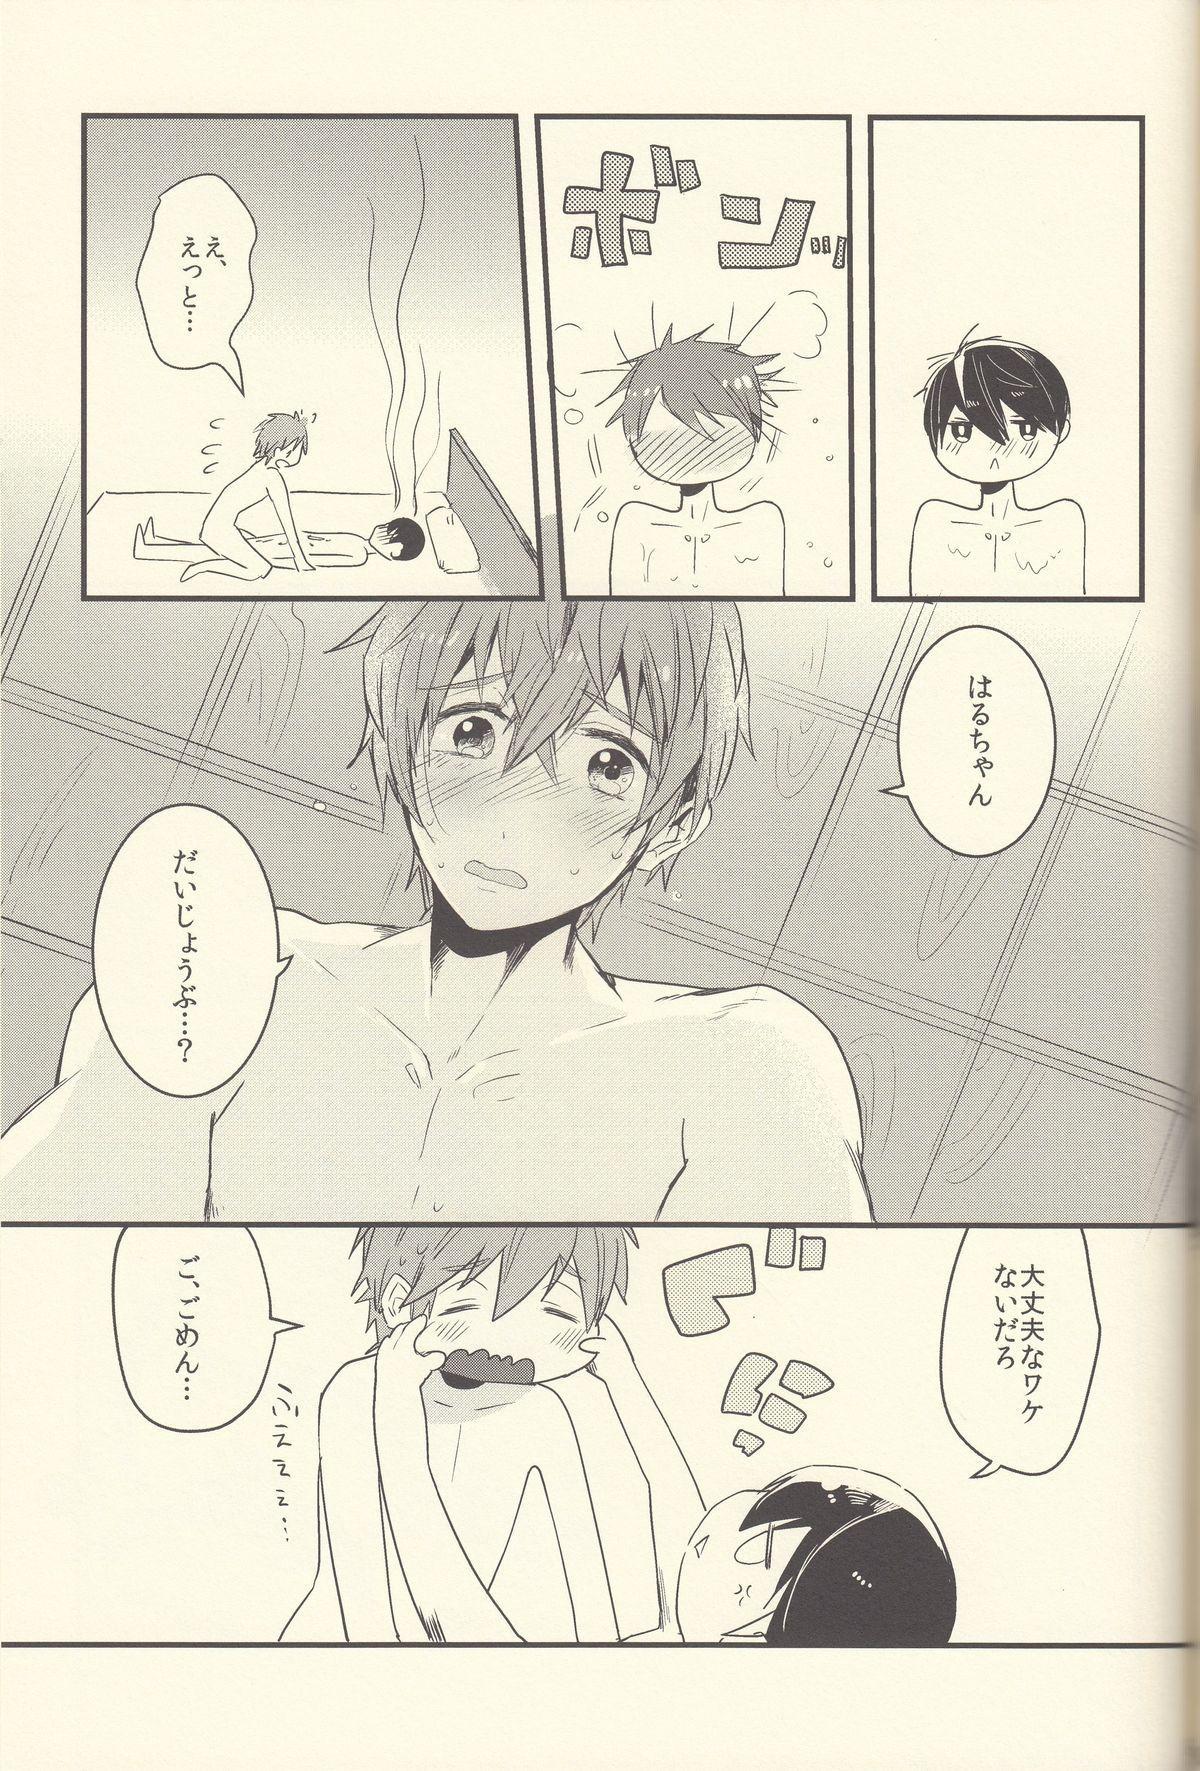 Shiofuki no Friendship - Makoto ♥ Haruka Squirting Anthology 58